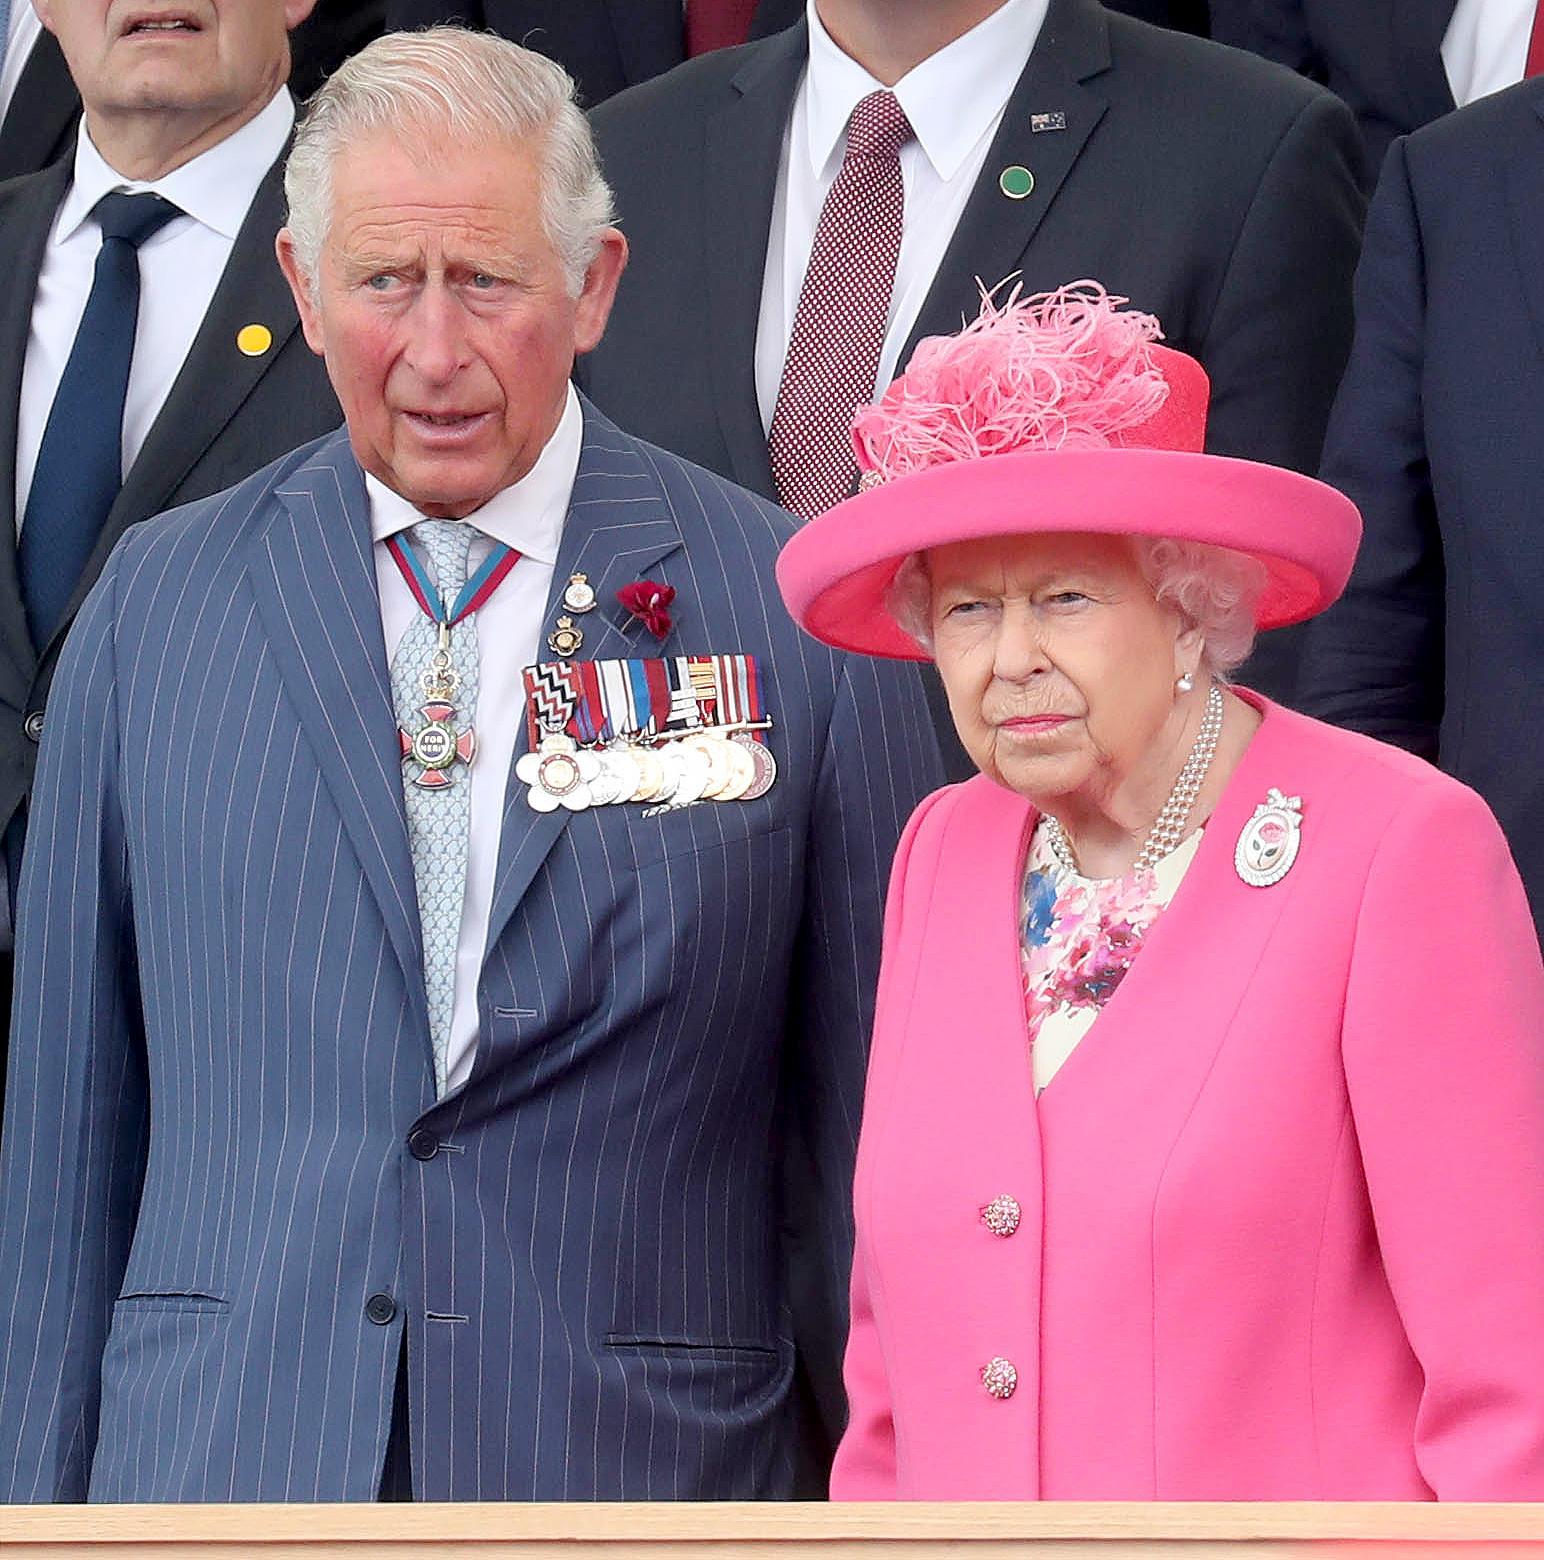 Inside Prince Charles Plans If Queen Elizabeth II Steps Down 1